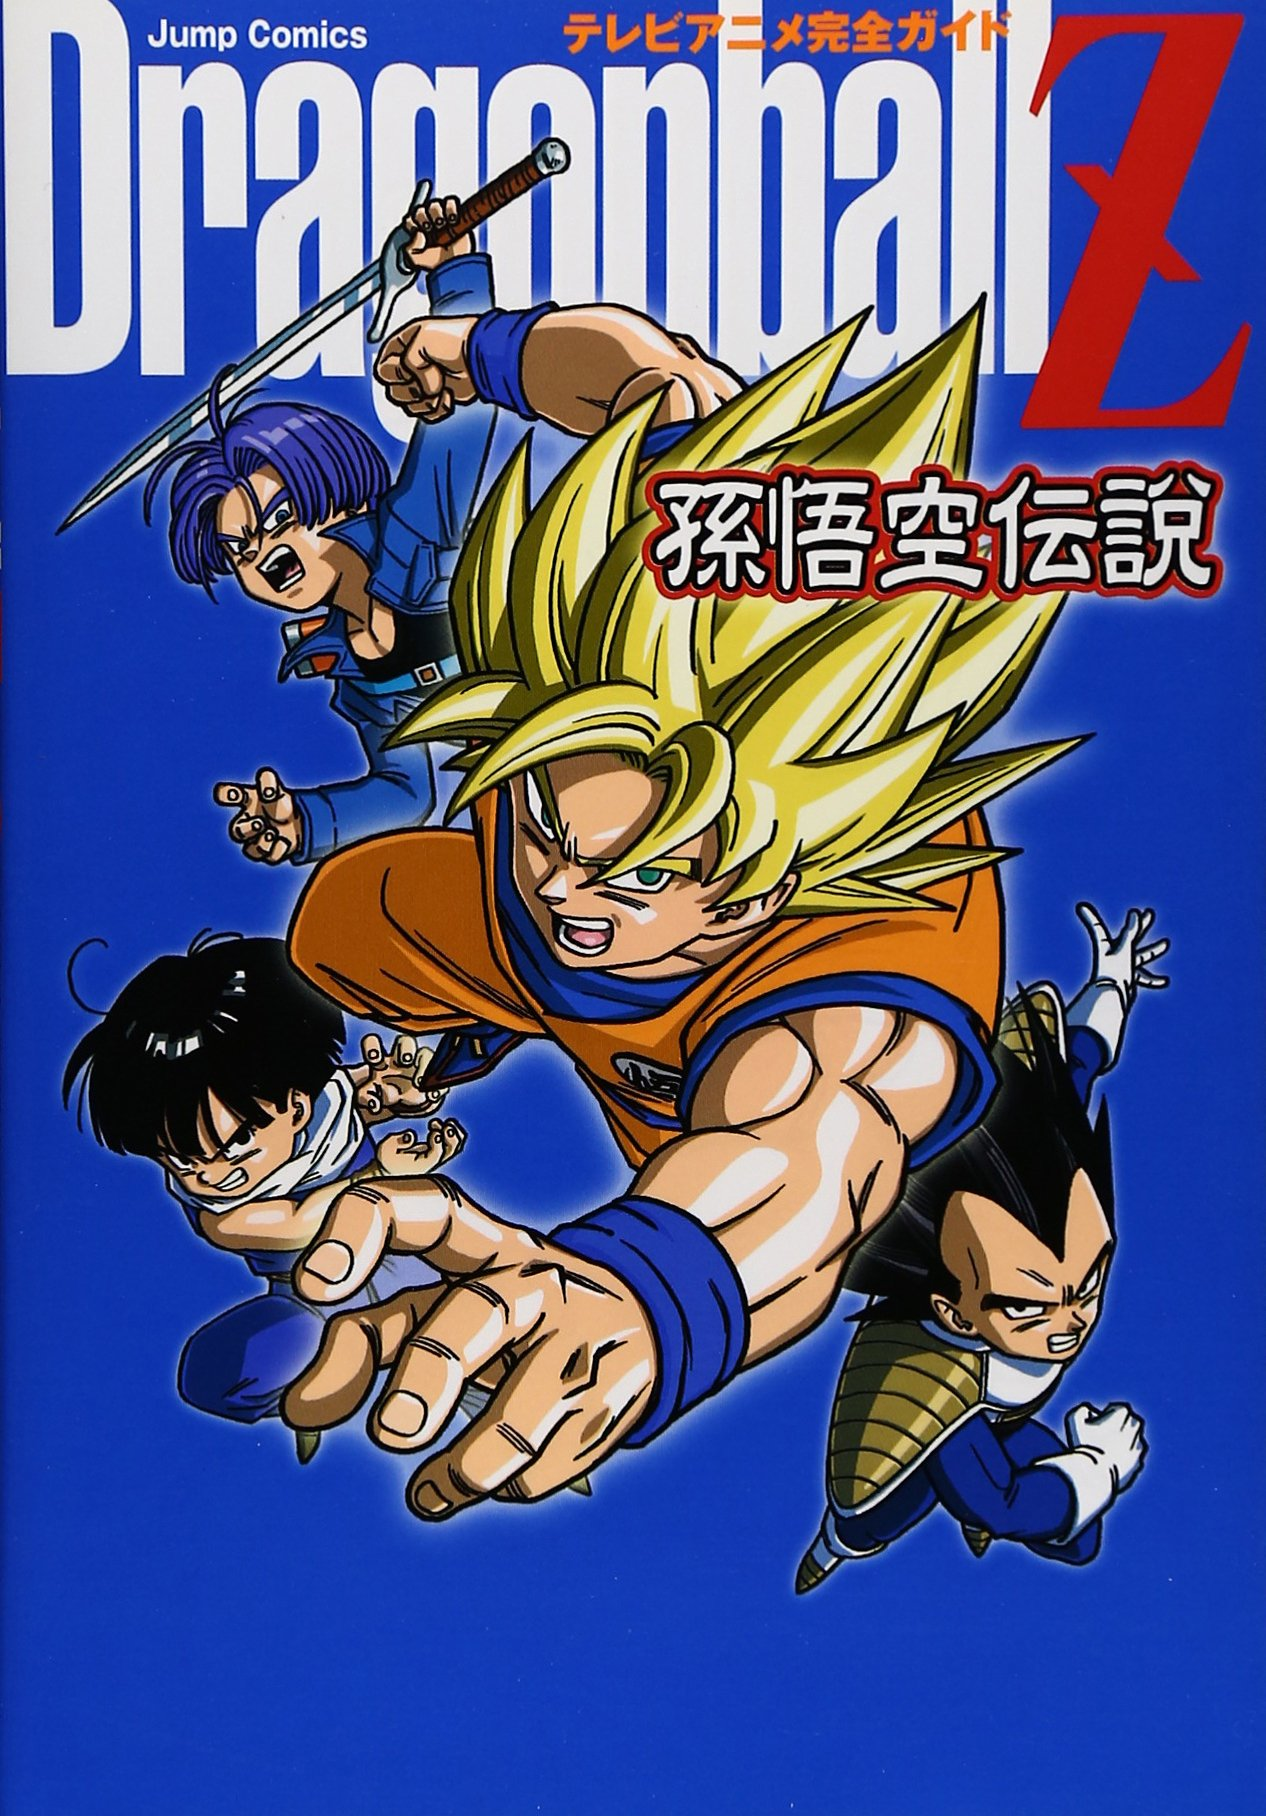 Presque toutes les œuvres d'Akira Toriyama – Semaine du 28 janvier au 3 février 2019 - Dragon Ball Z Son Goku Densetsu